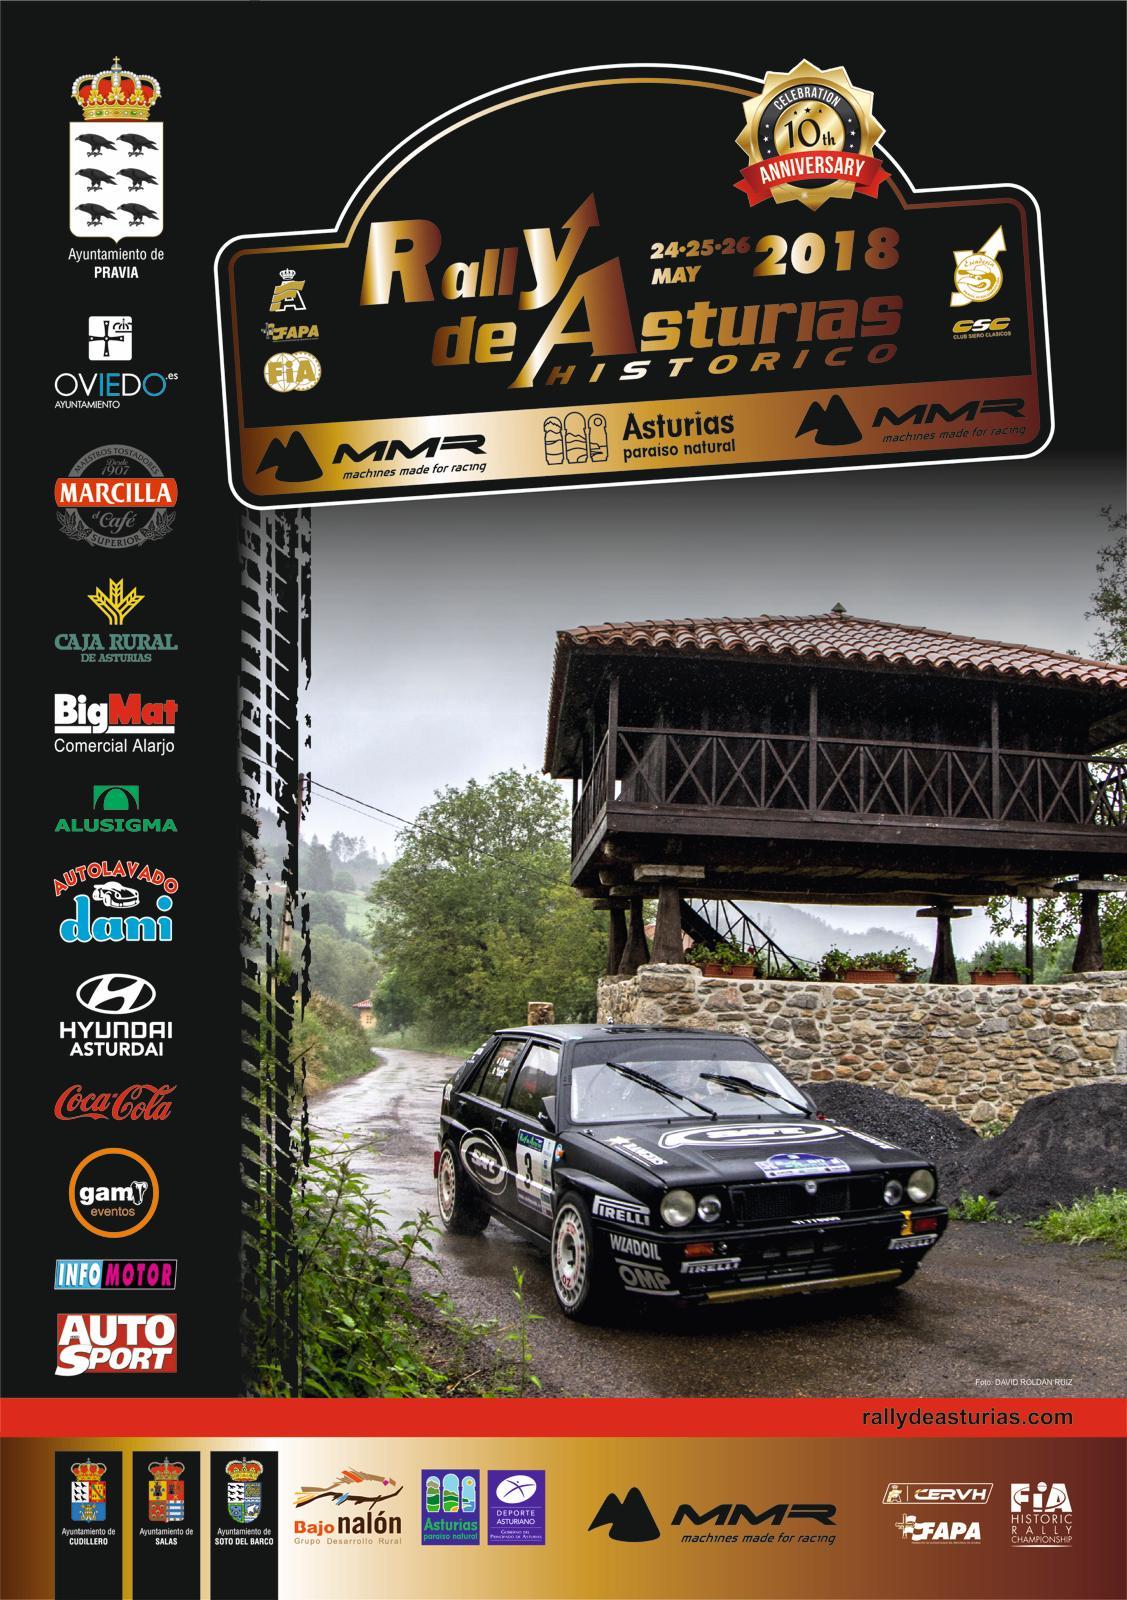 CERV + ERCH: Rallye de Asturias Histórico [24-26 Mayo] Dbp8LbaW4AA9DuS